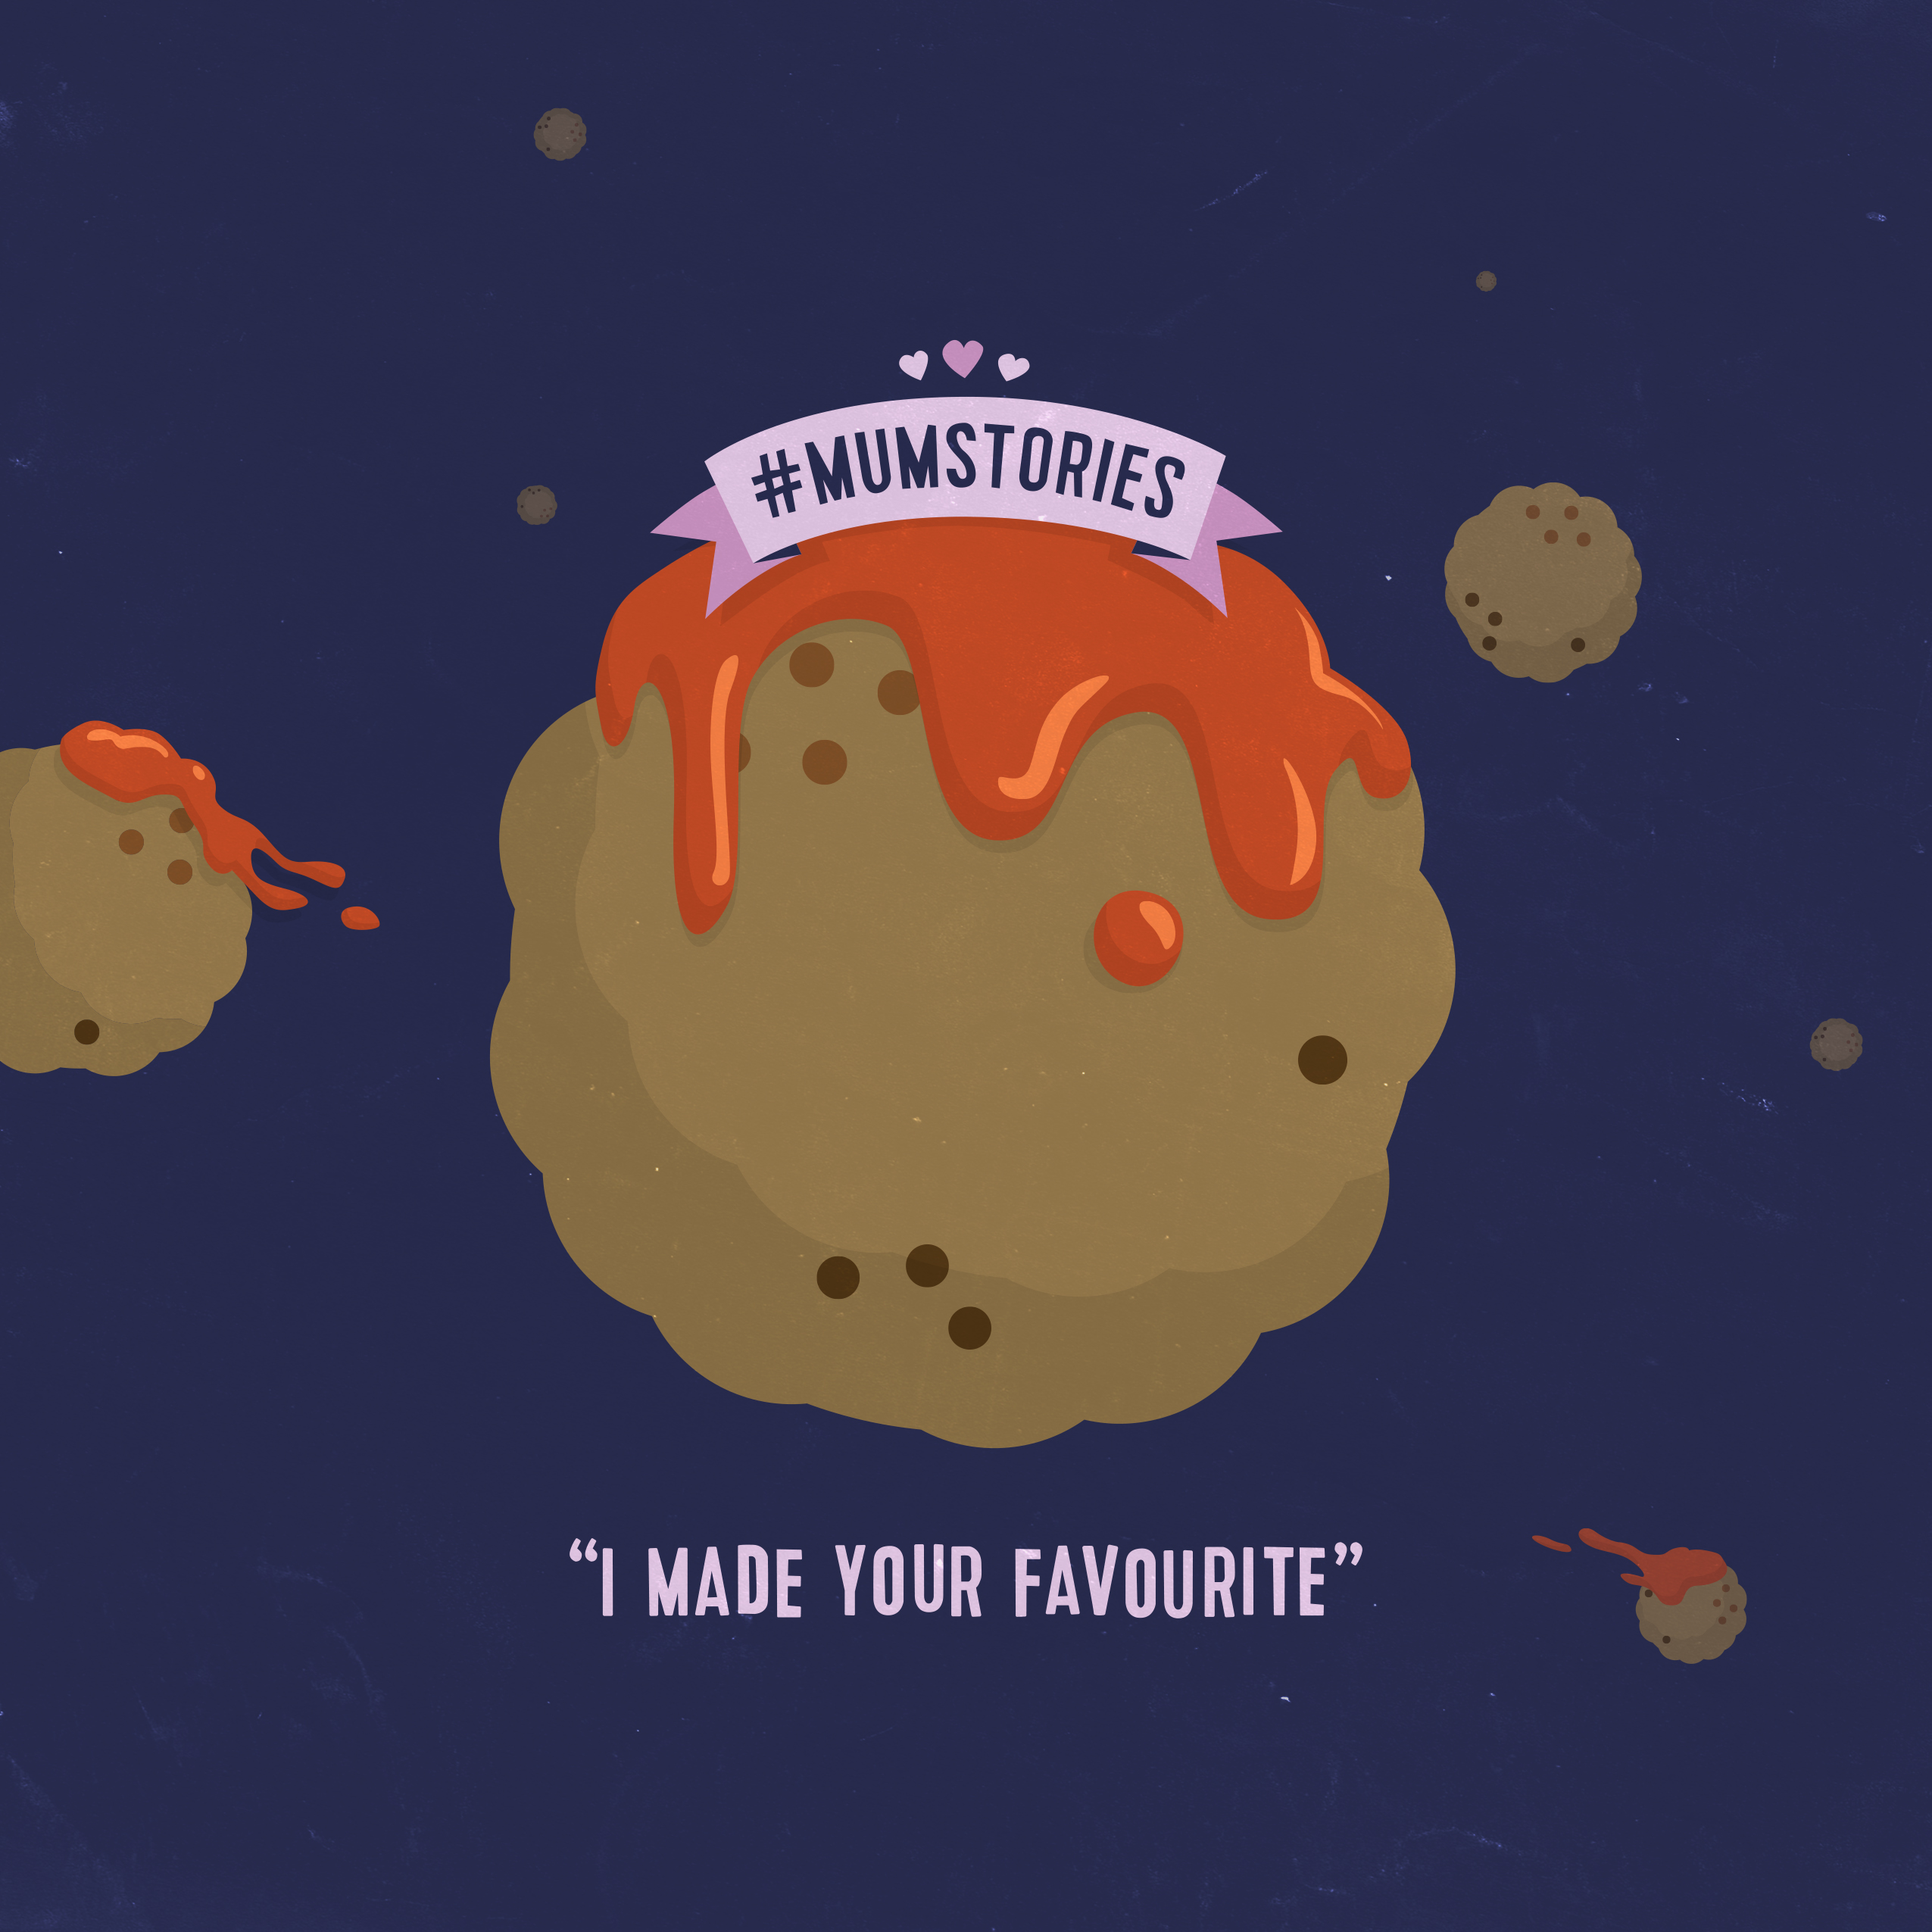 mumstories_meatballs (1) (1)